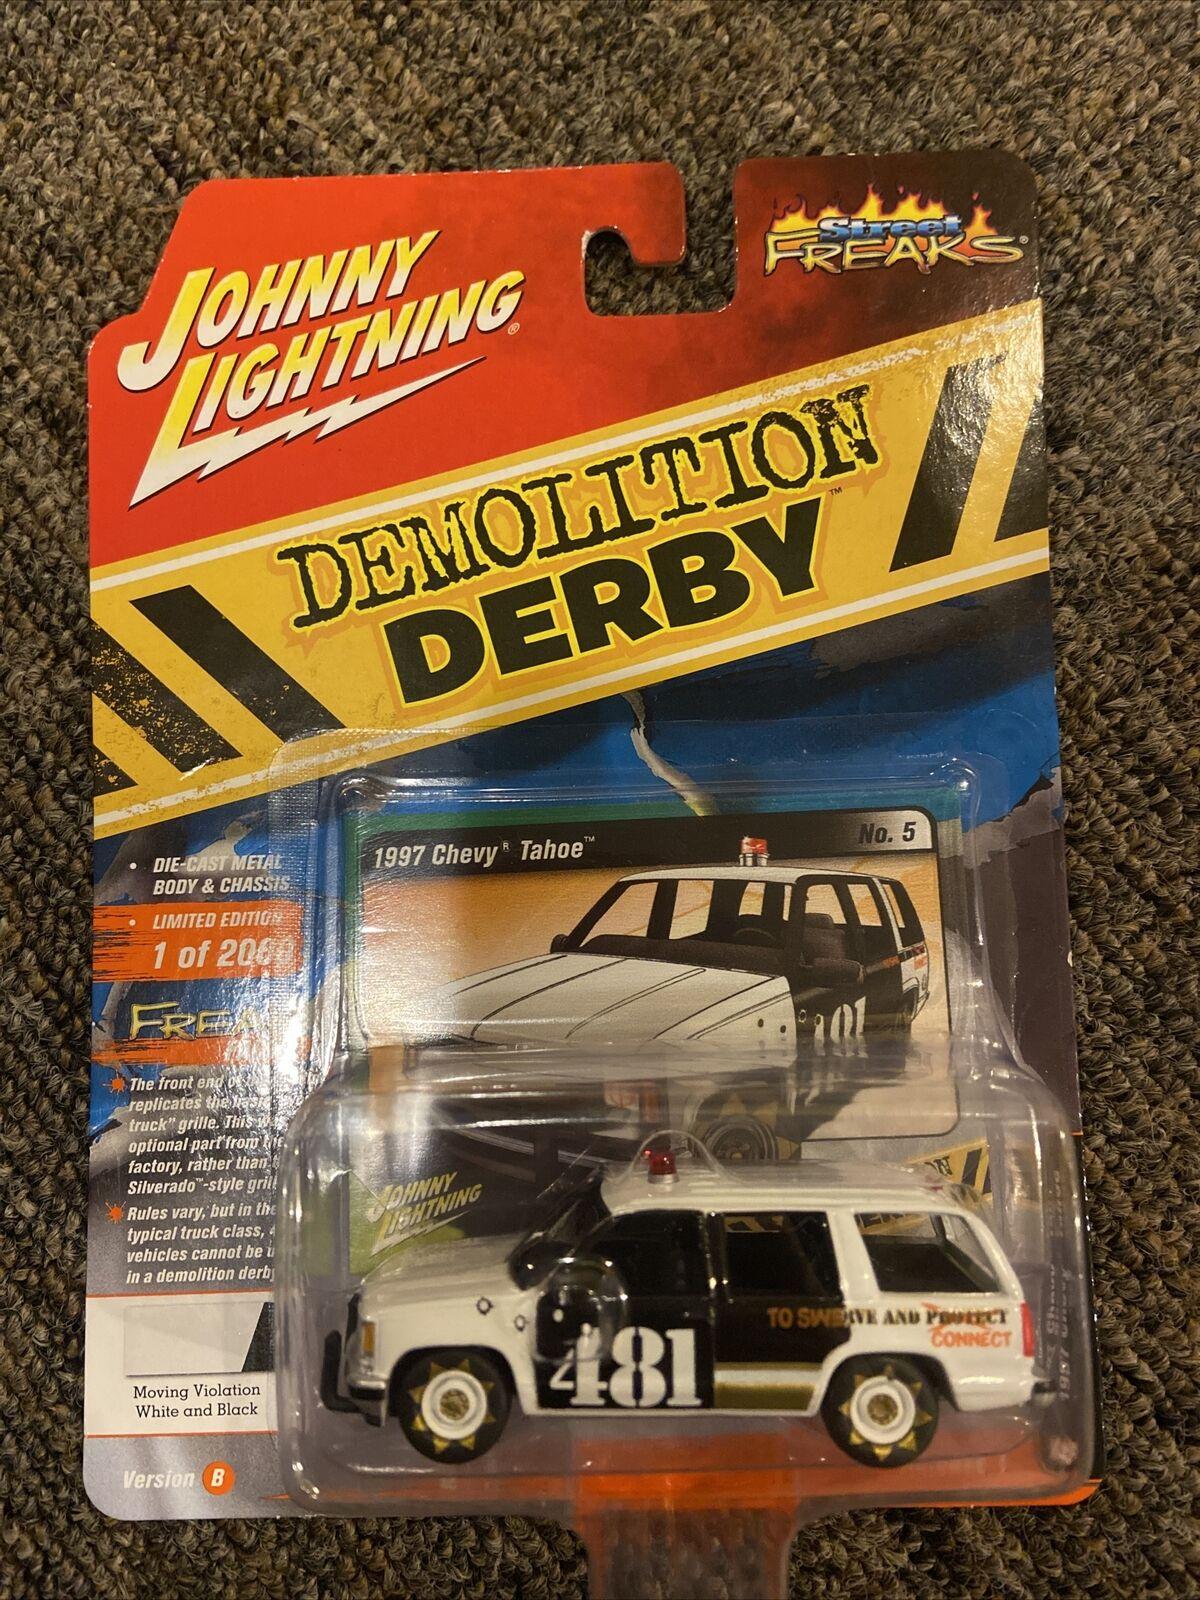 Johnny lightning street freaks demolition derby 1997 chevy tahoe ng59